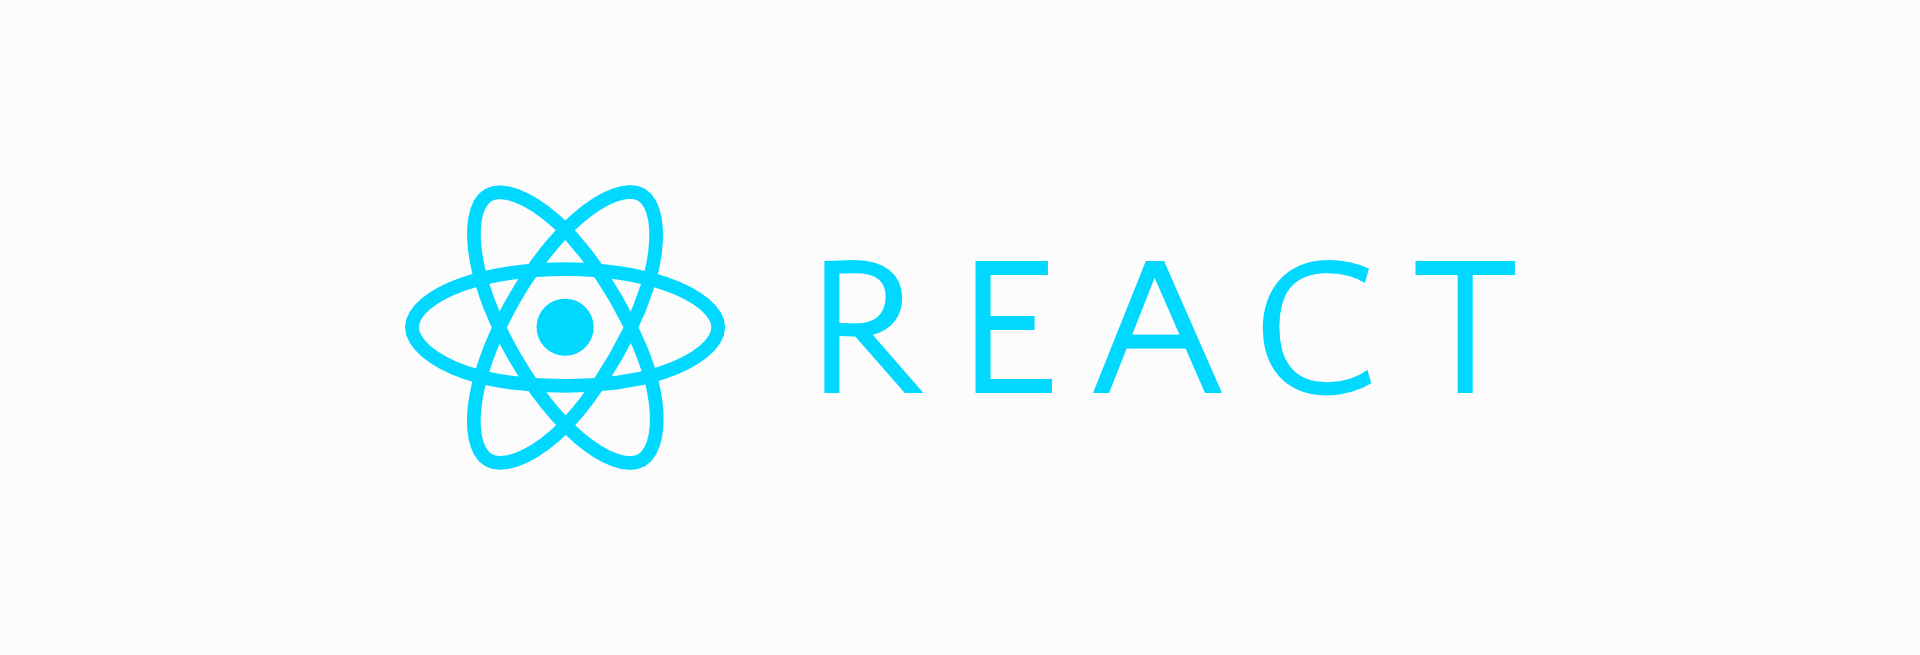 Langage de programmation React